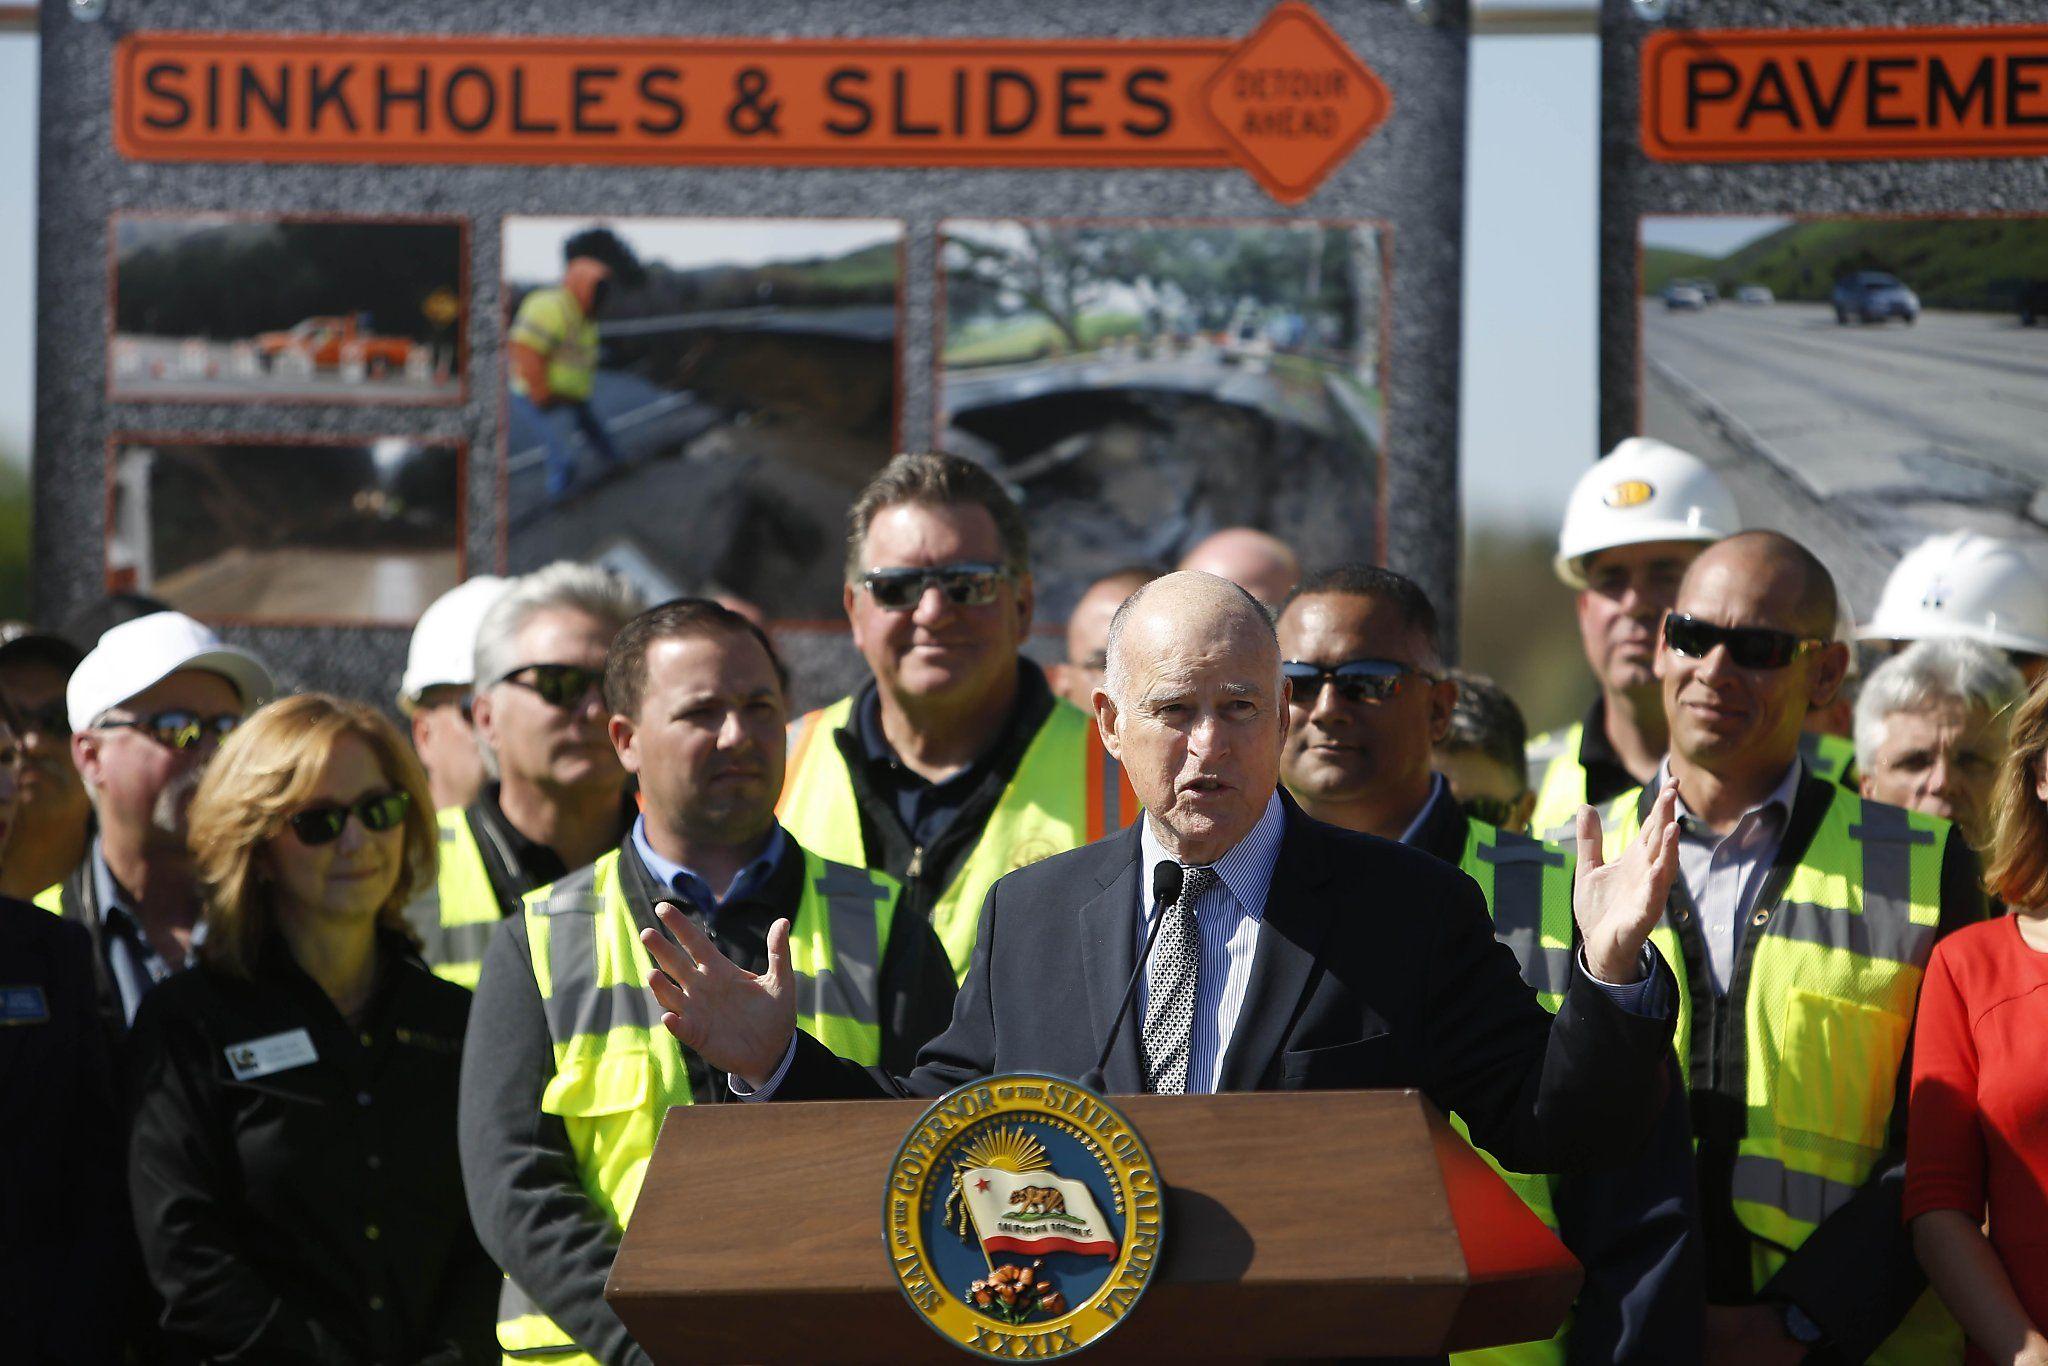 Gov. Jerry Brown plays hardball to pass transportation bill - San Francisco Chronicle